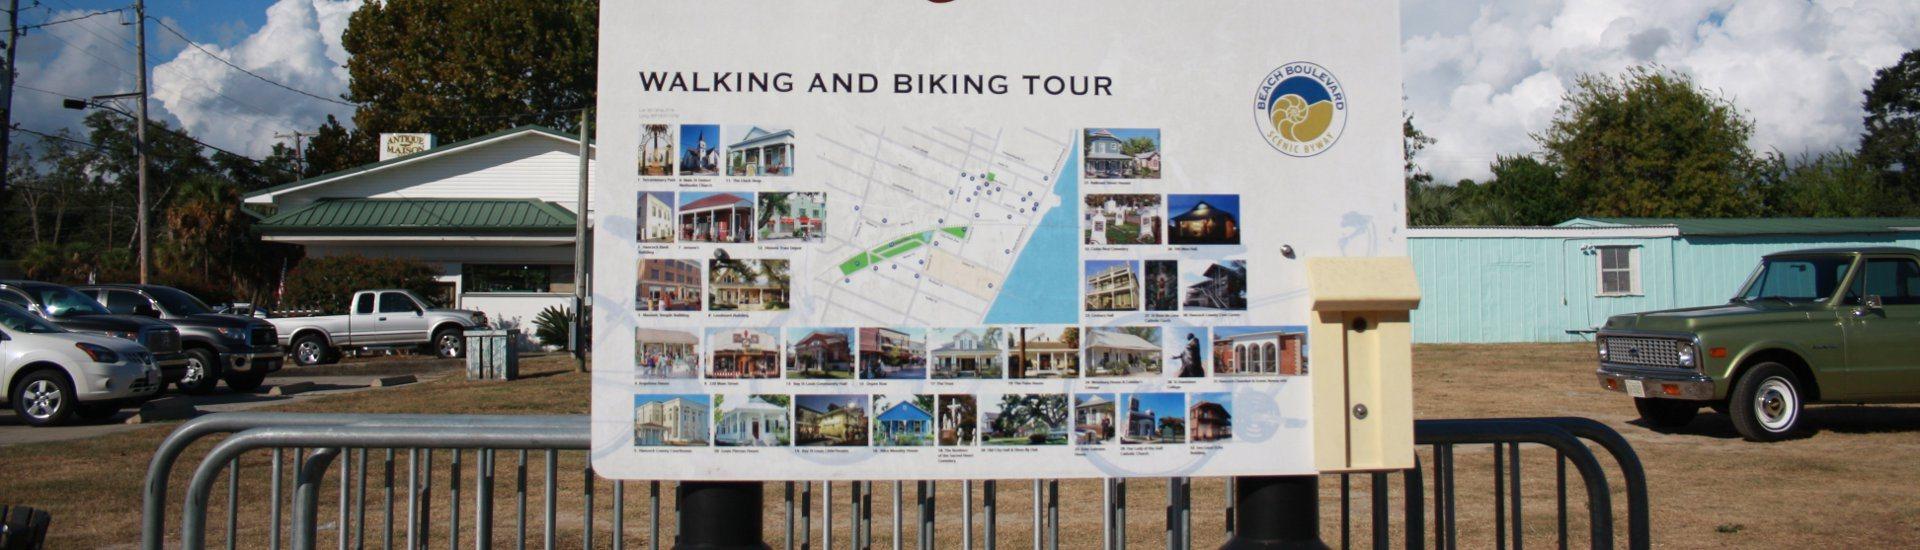 Bay St. Louis Historic Walking & Biking Tour